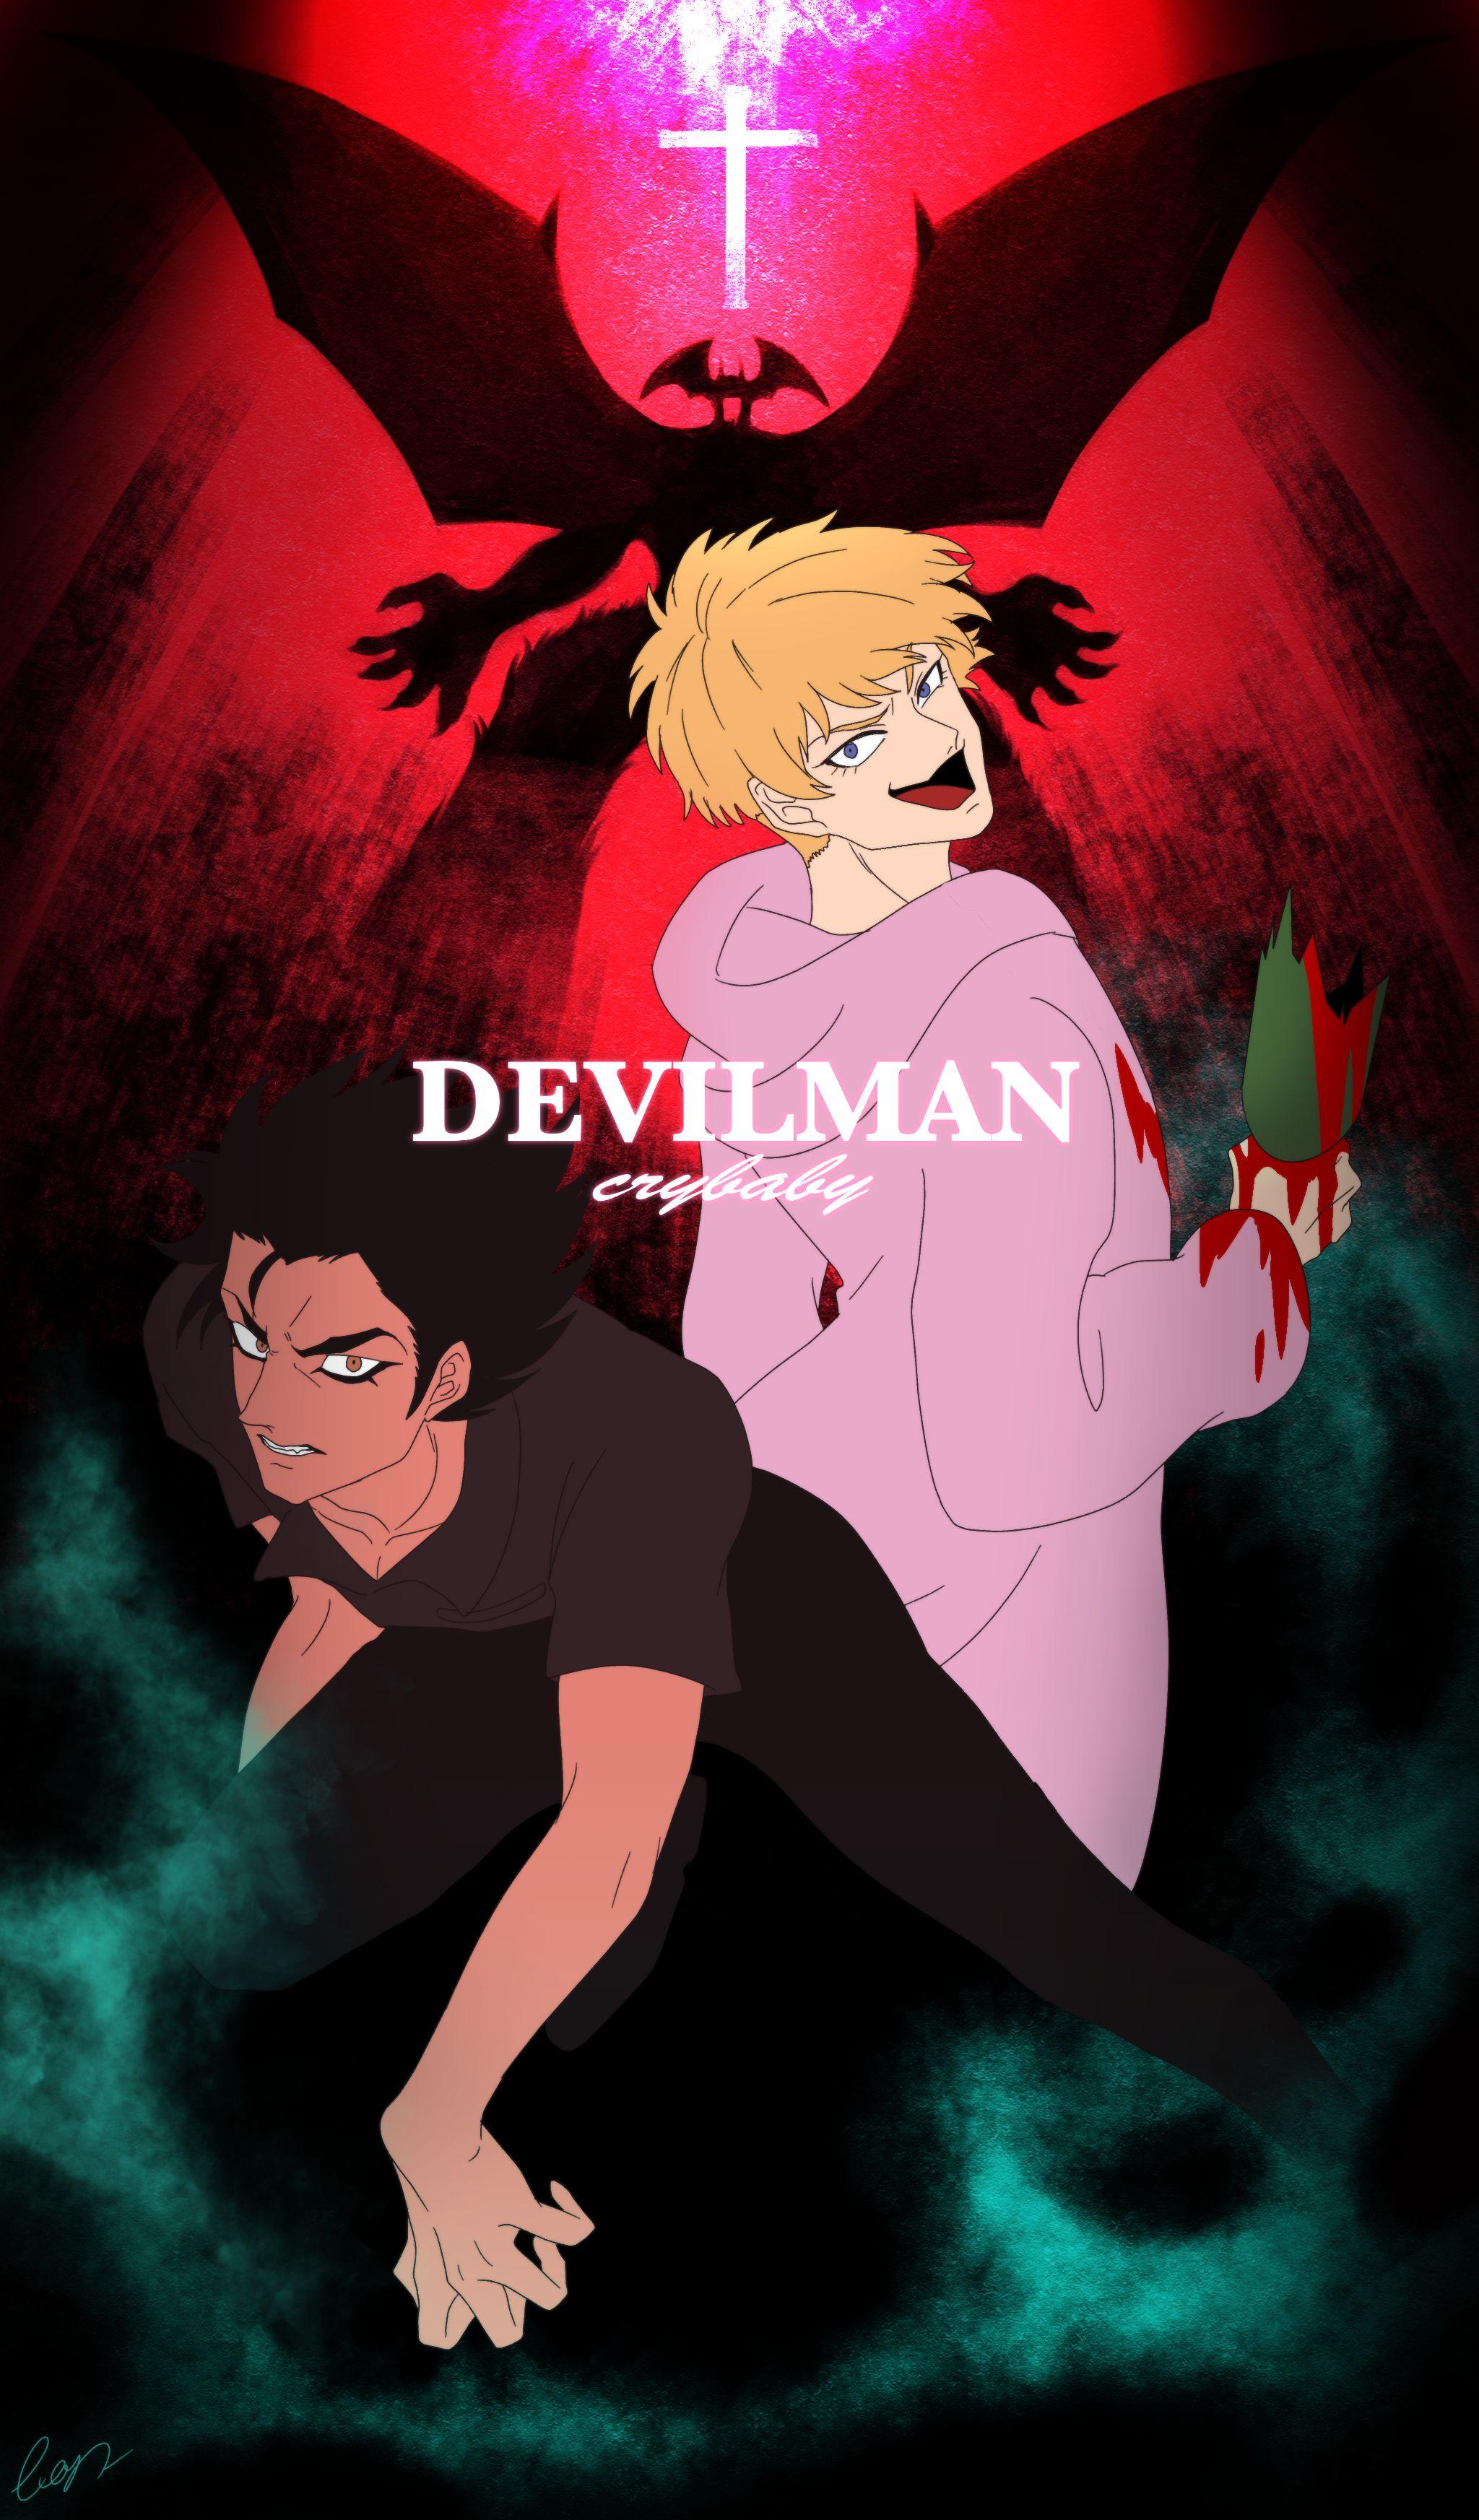 Devilman Crybaby Ryo Asuka Akira Fudo Devilman Crybaby Anime Cry Baby